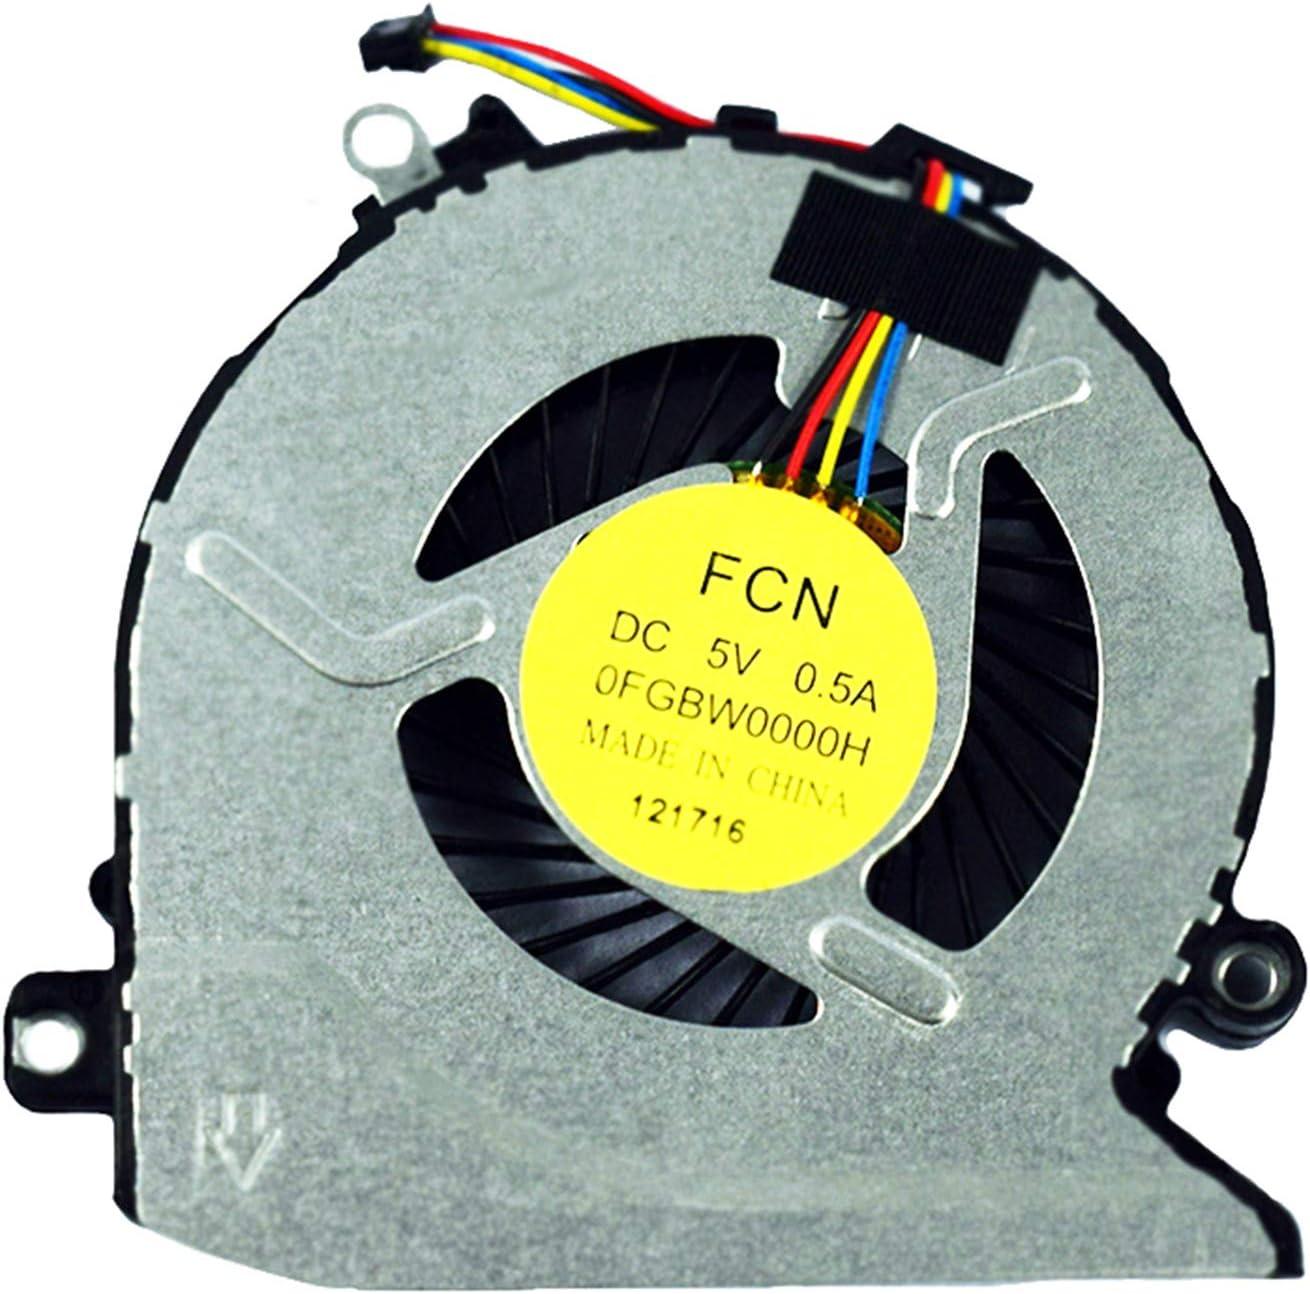 Power4Laptops Replacement Laptop Fan for HP Envy 17-n102no HP Envy 17-n102ur HP Envy 17-n102TX HP Envy 17-n103nc HP Envy 17-n103la